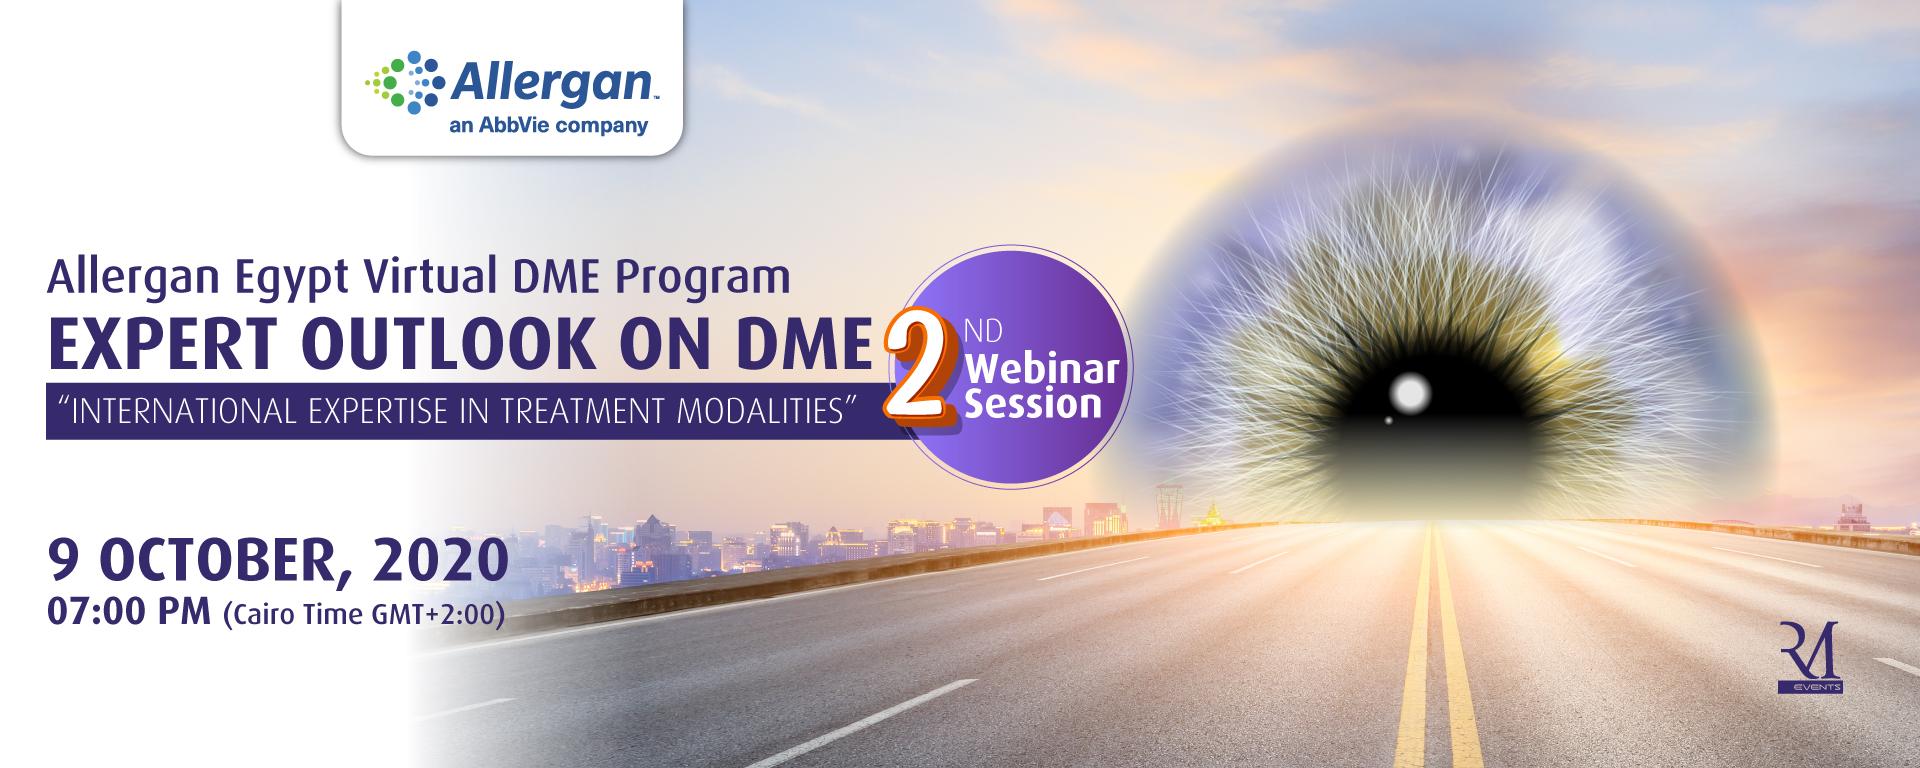 2nd Allergan Egypt Virtual DME Program